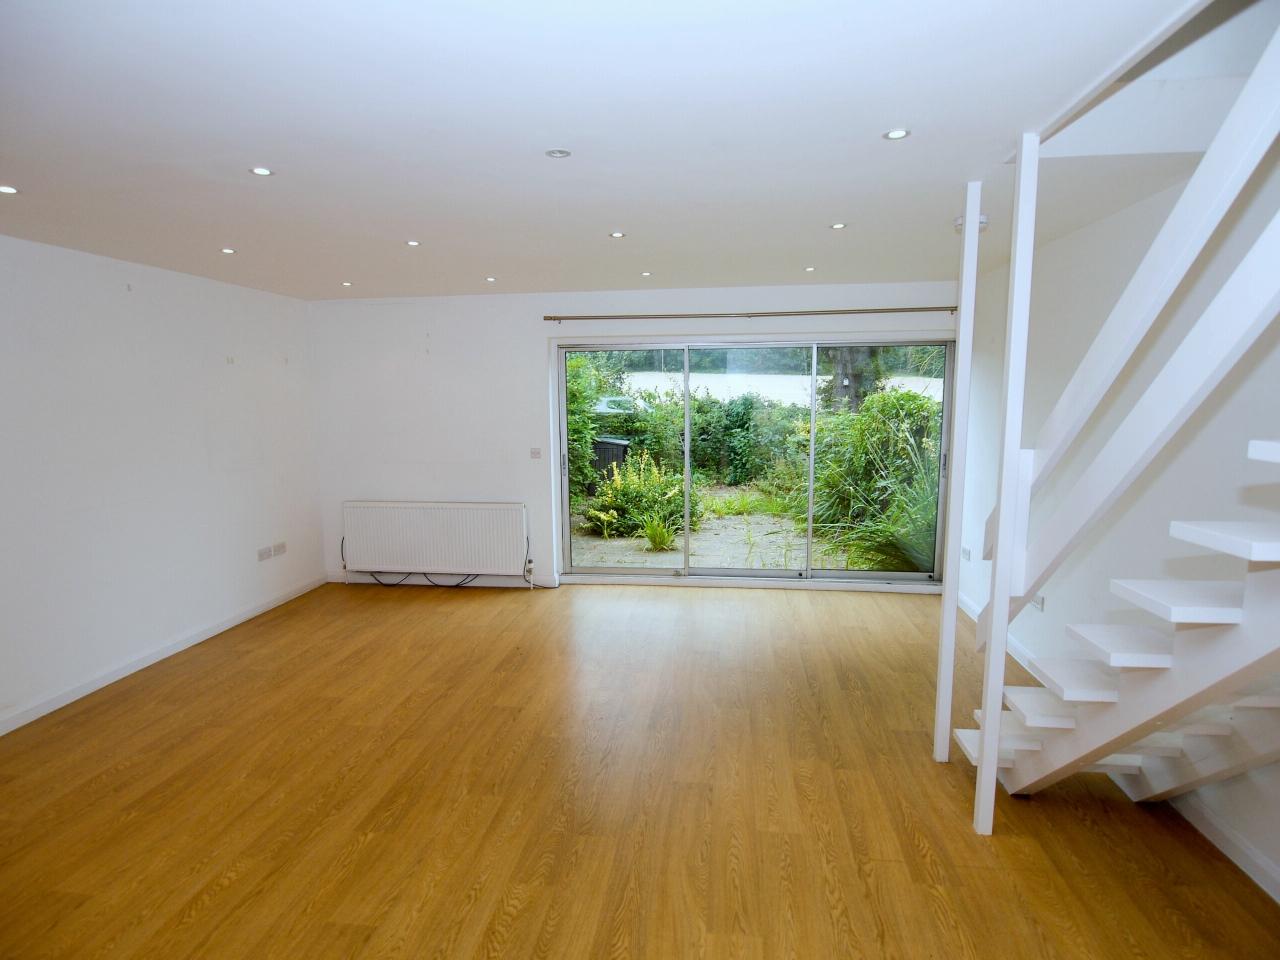 3 bedroom mid terraced house Sold in Sevenoaks - Photograph 2